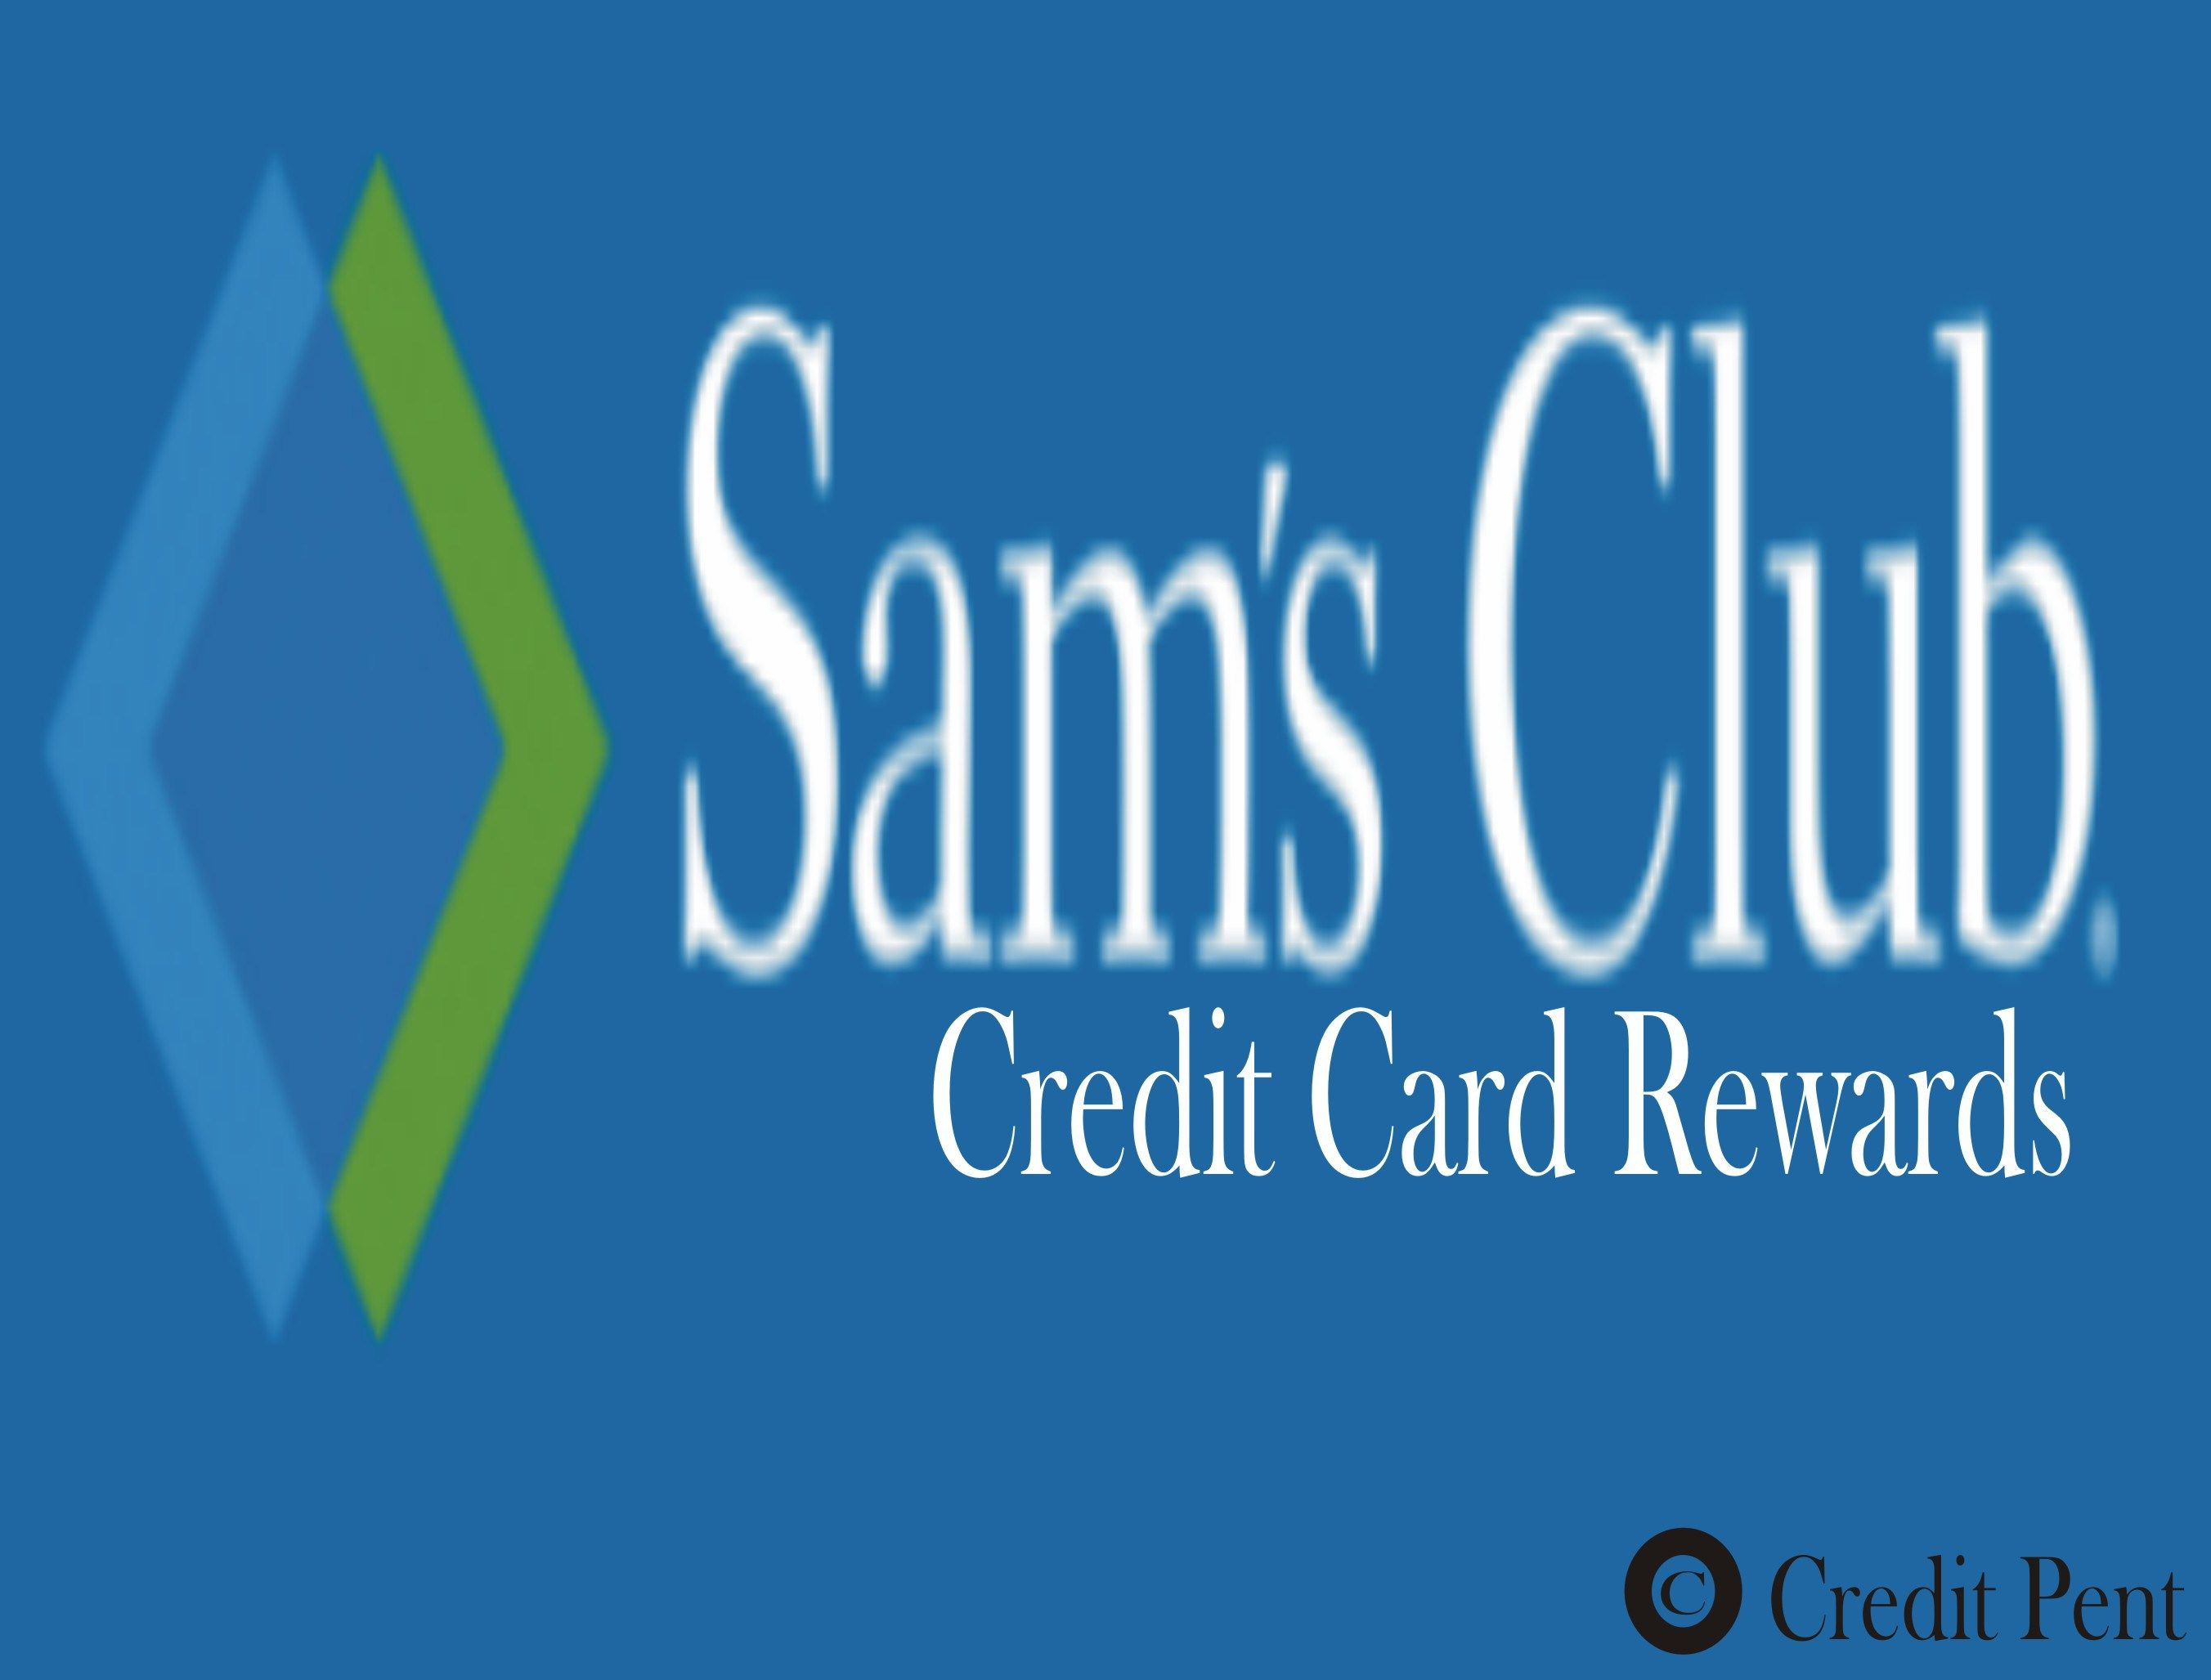 Samsclub Credit Login >> Sams Club Credit Card Rewards Login Application